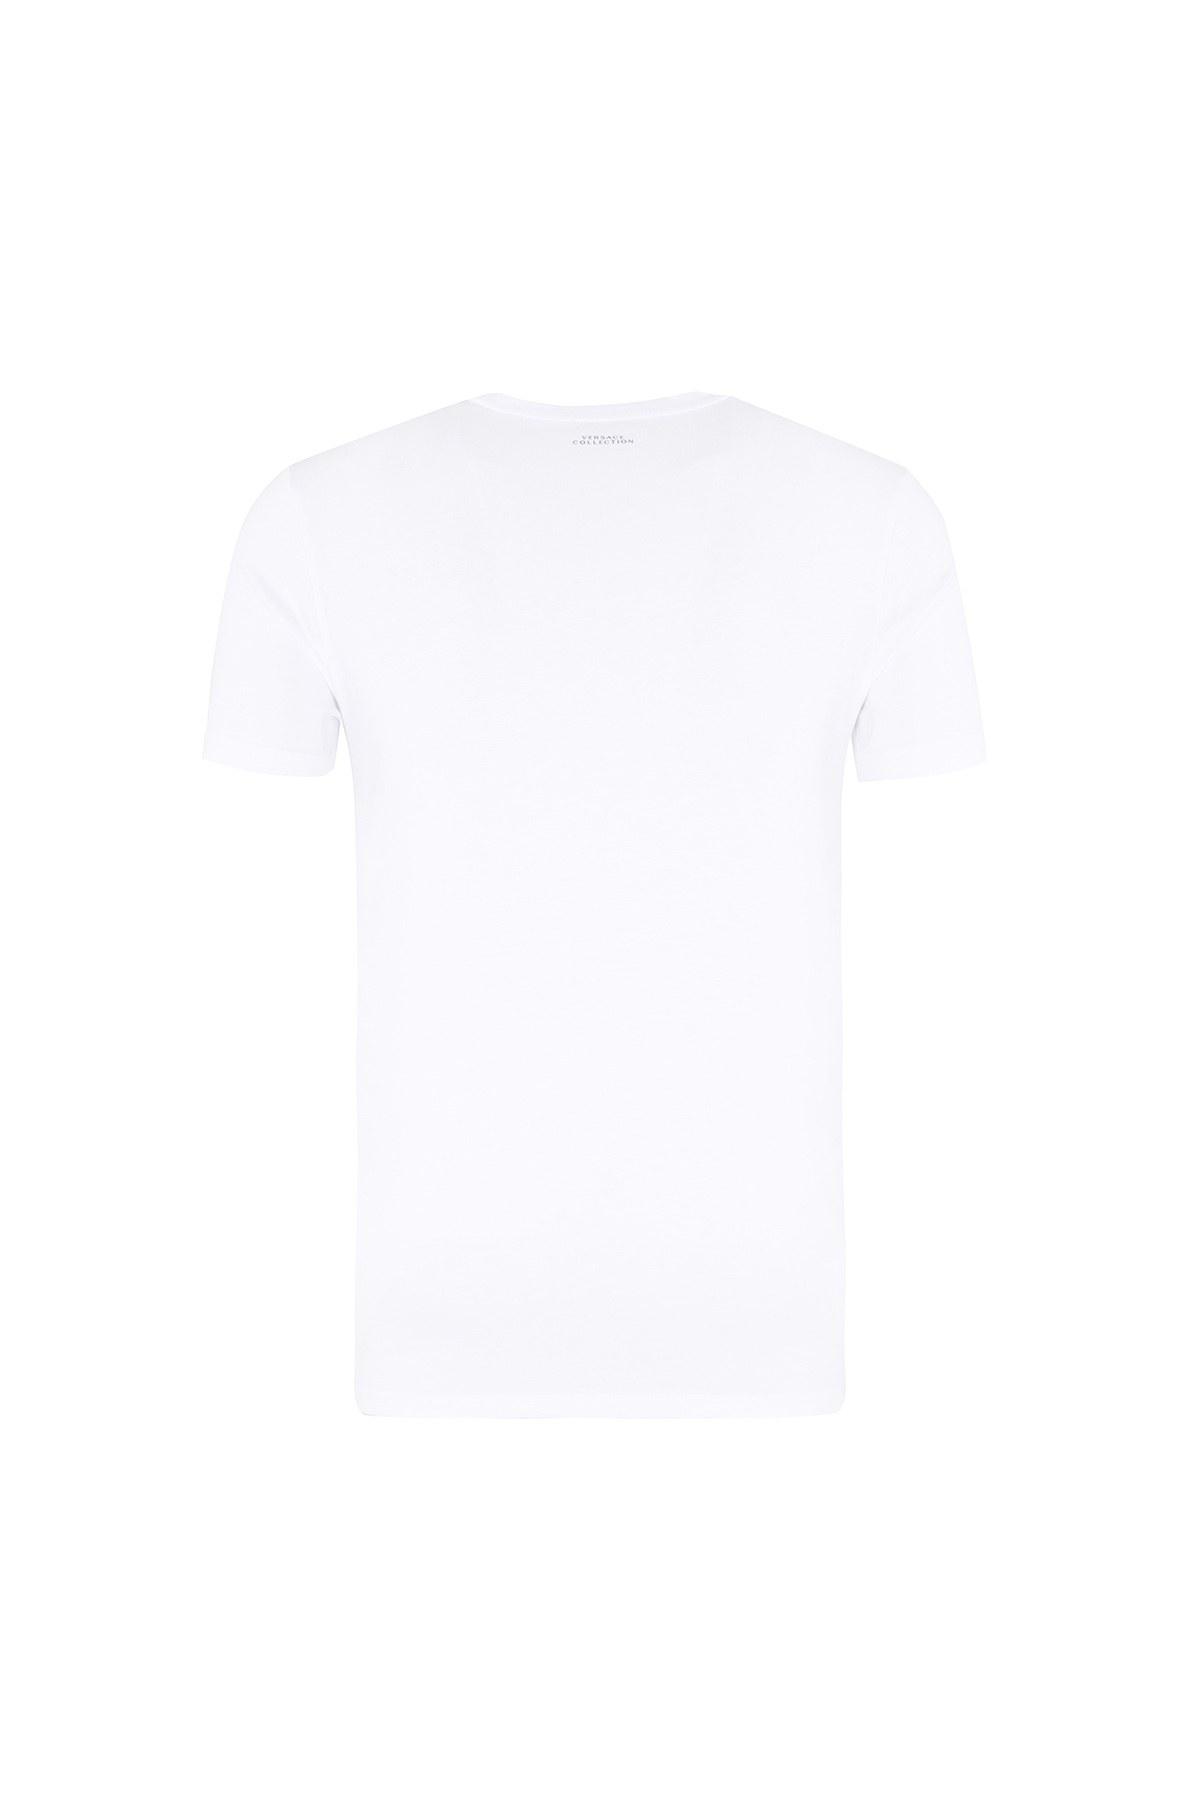 VERSACE COLLECTION T SHIRT Erkek T Shirt V800683S VJ00472 V7001 BEYAZ